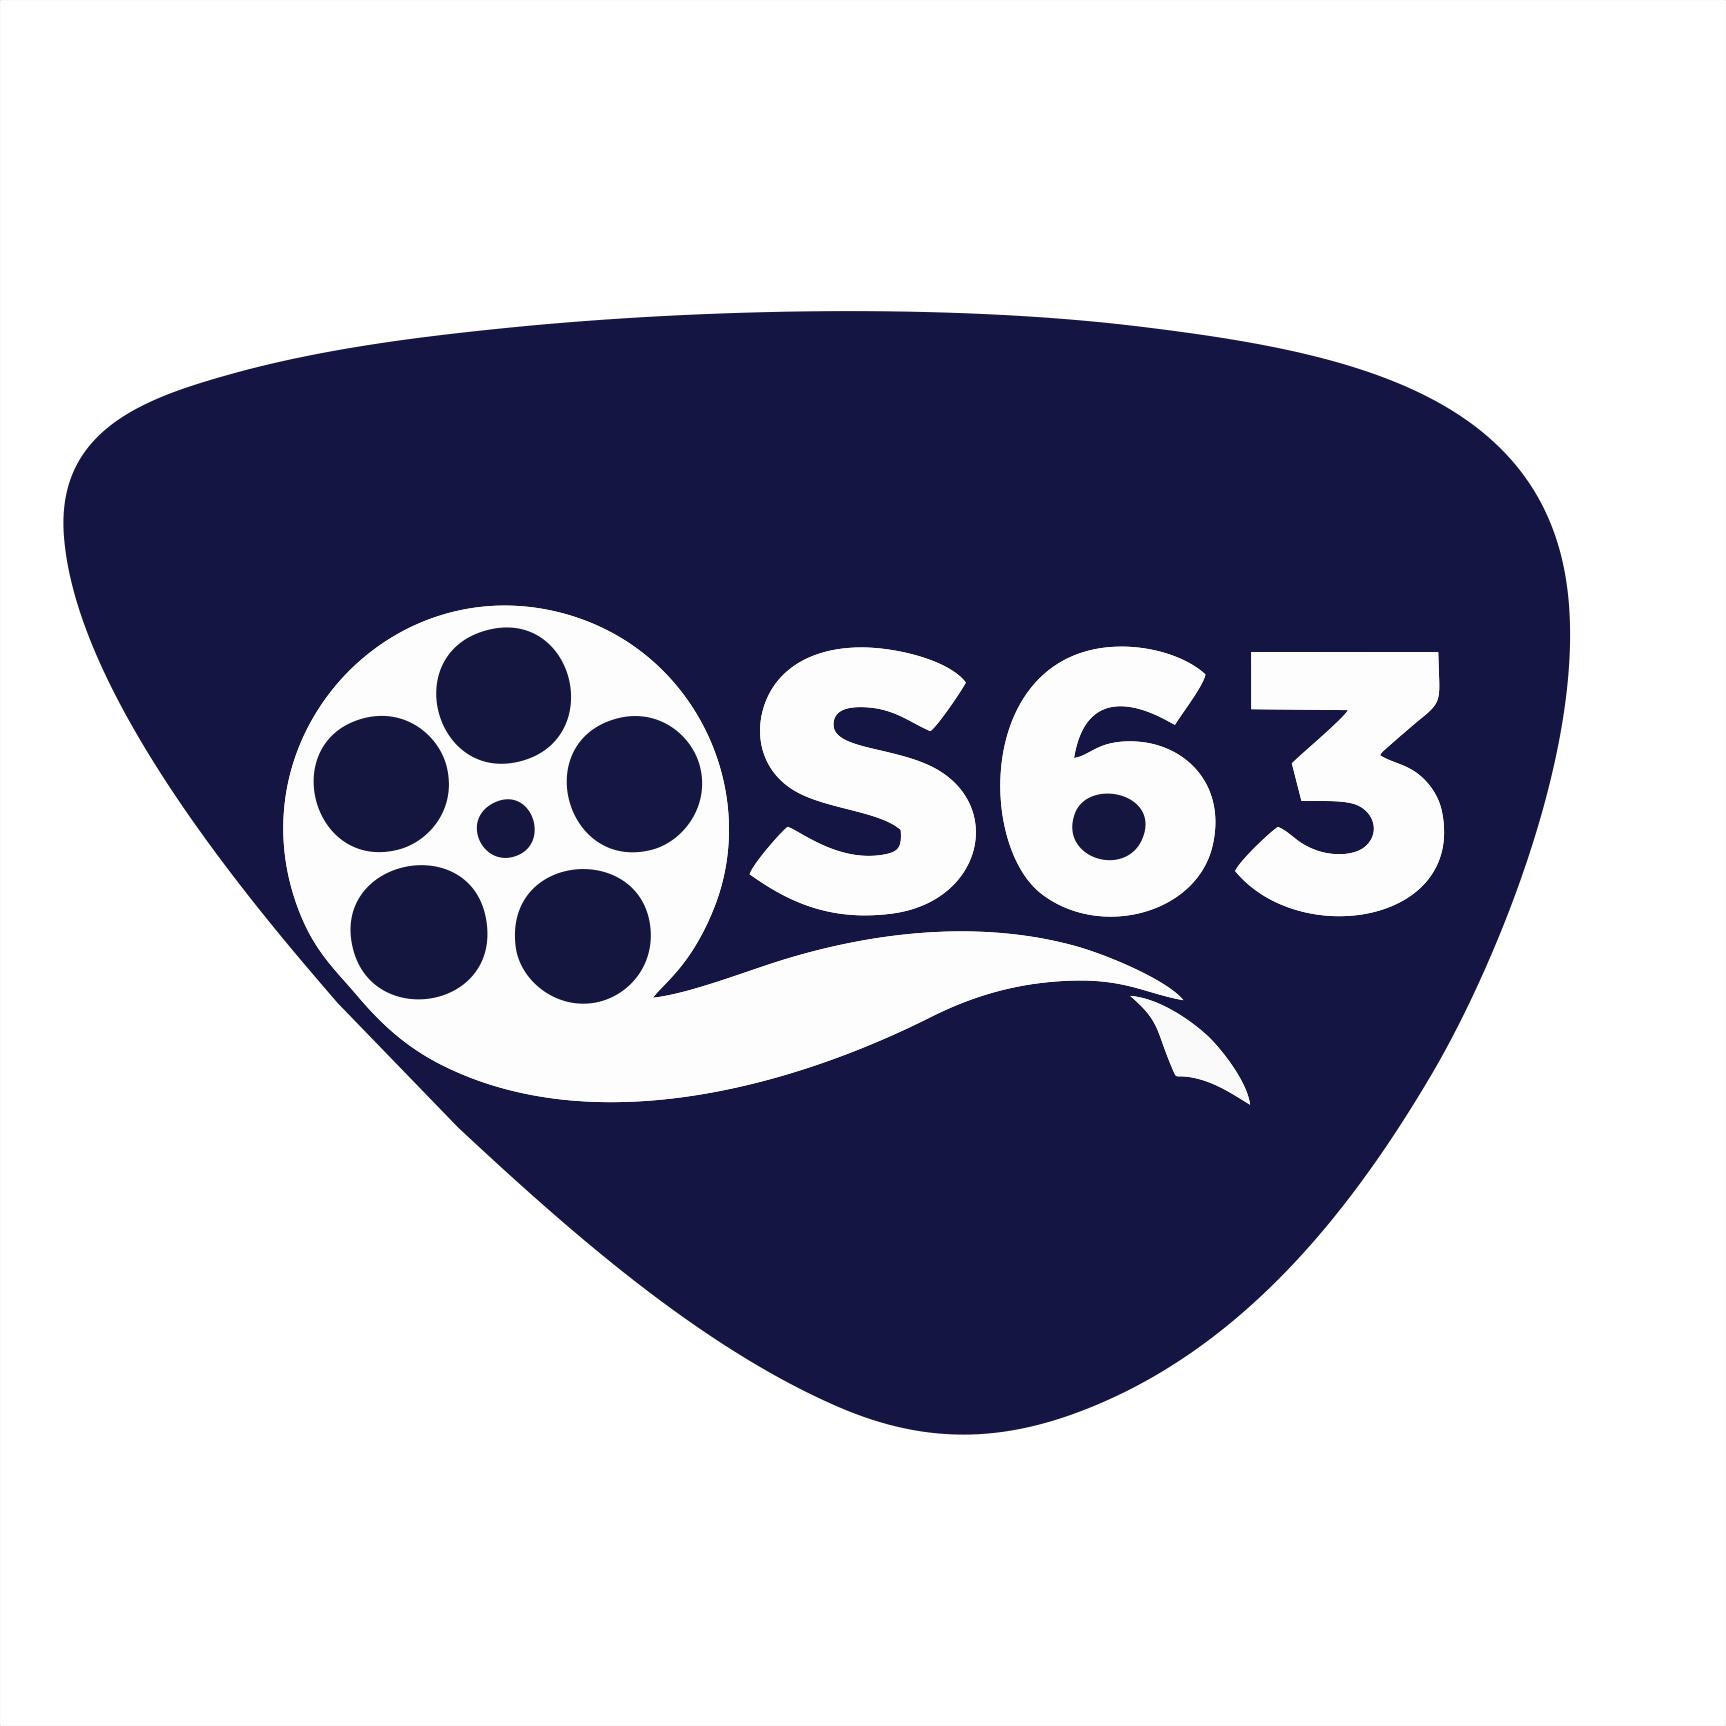 Studio 63 Productions